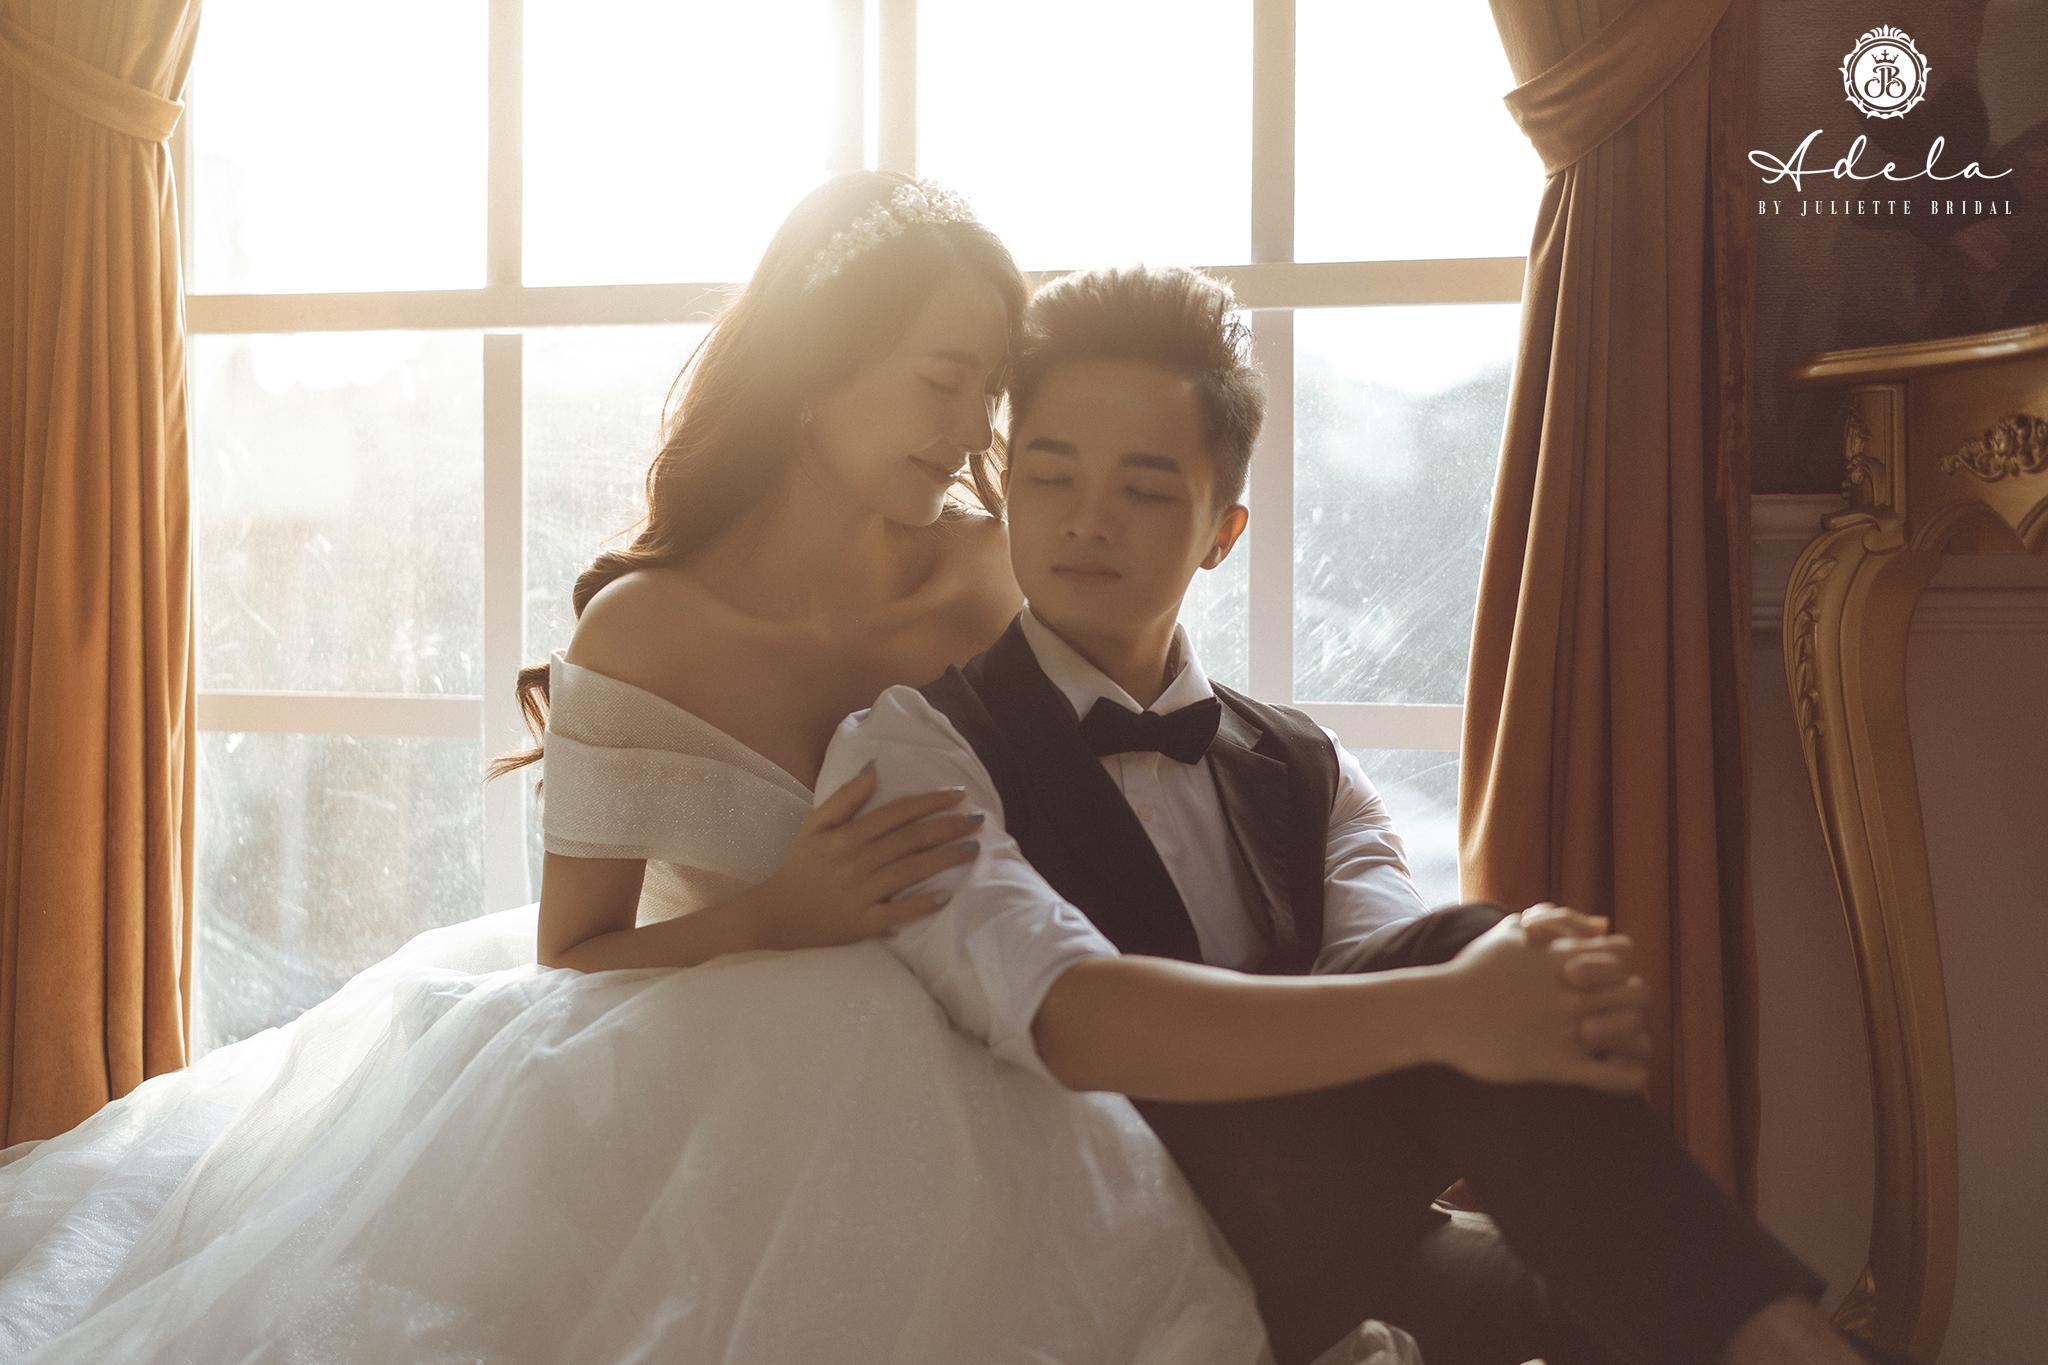 BST Adela (Adela Collection) | Top các mẫu váy cưới đơn giản 2021 20